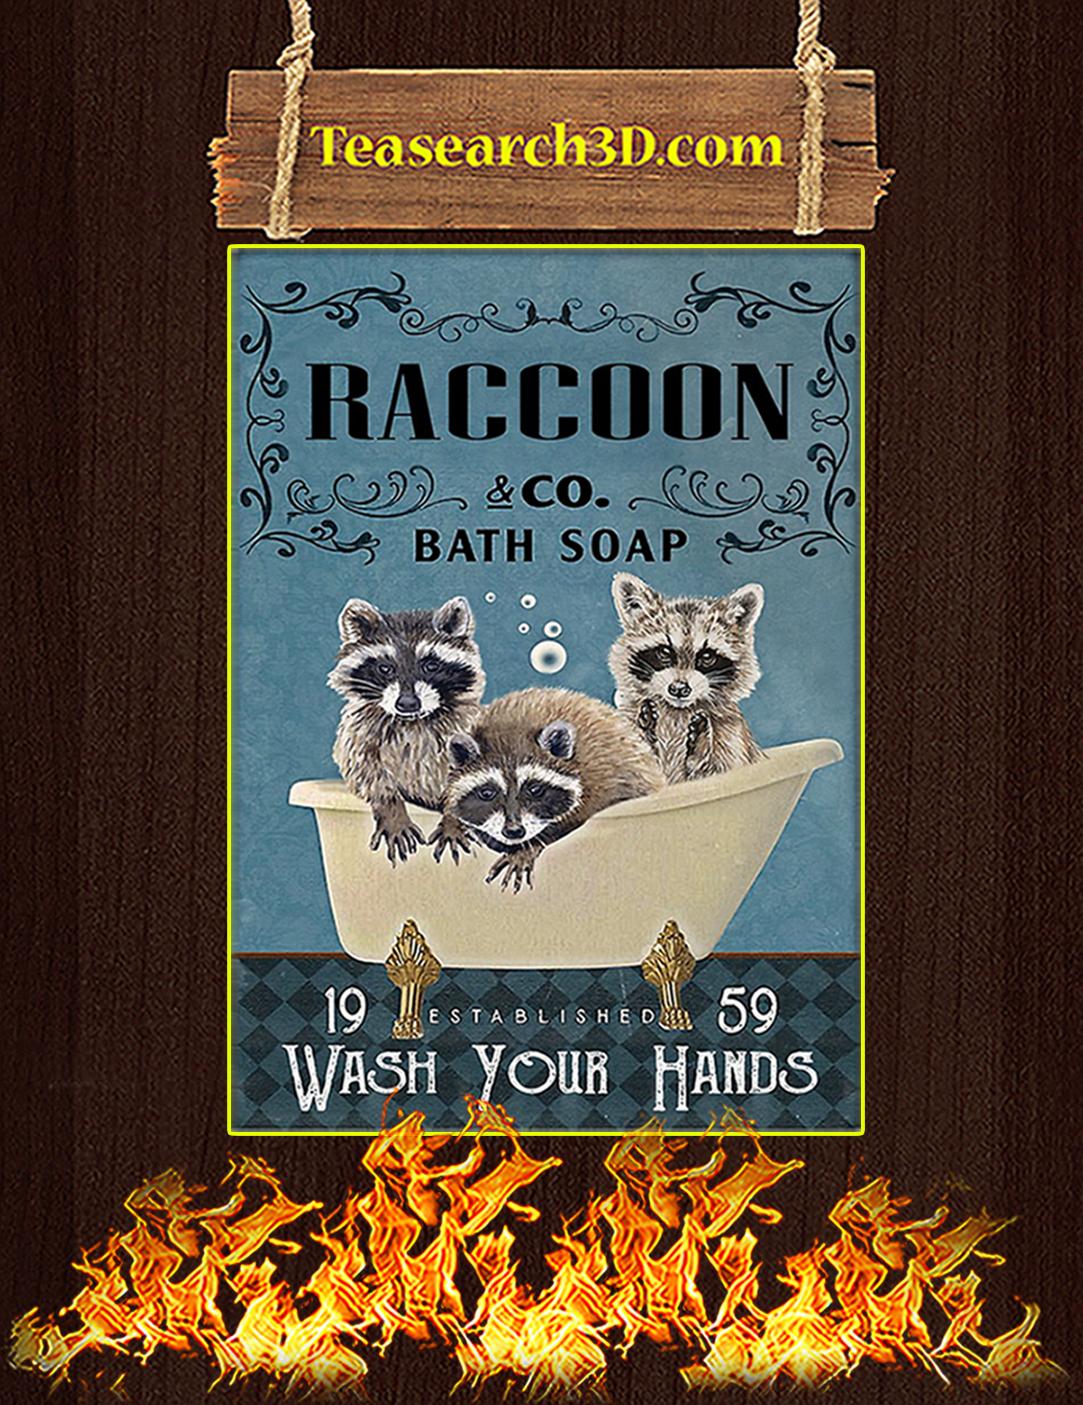 Raccoon Company Bath Soap Poster A2